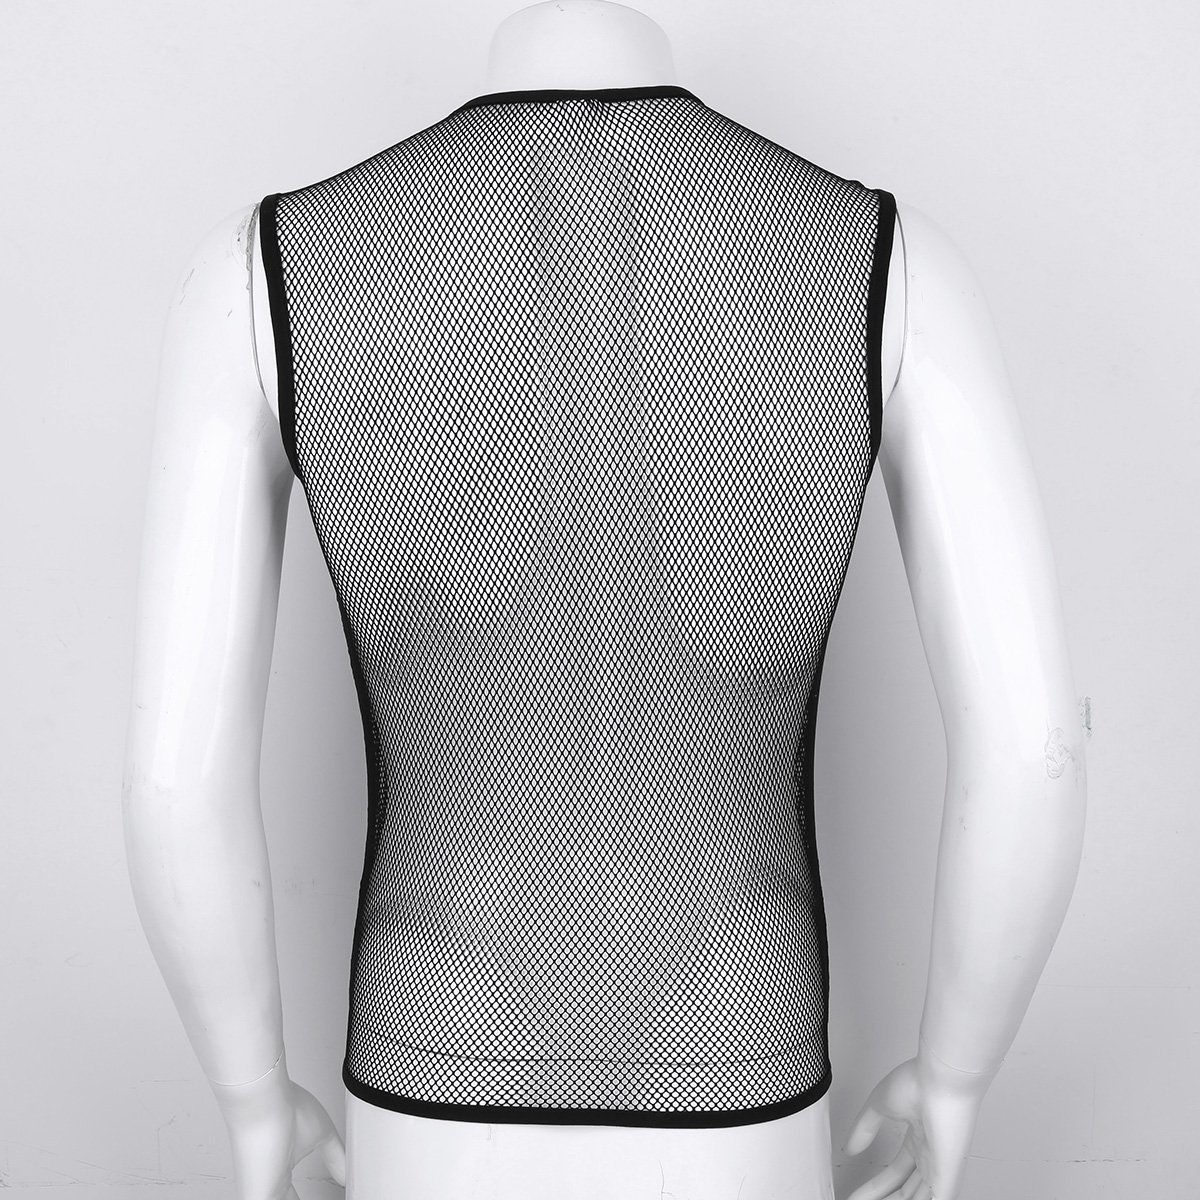 913338a2f Amazon.com: iiniim Men's Mesh See Through Fishnet Zipper Clubwear Vest Shirt  Sport Tank Top Undershirt: Clothing